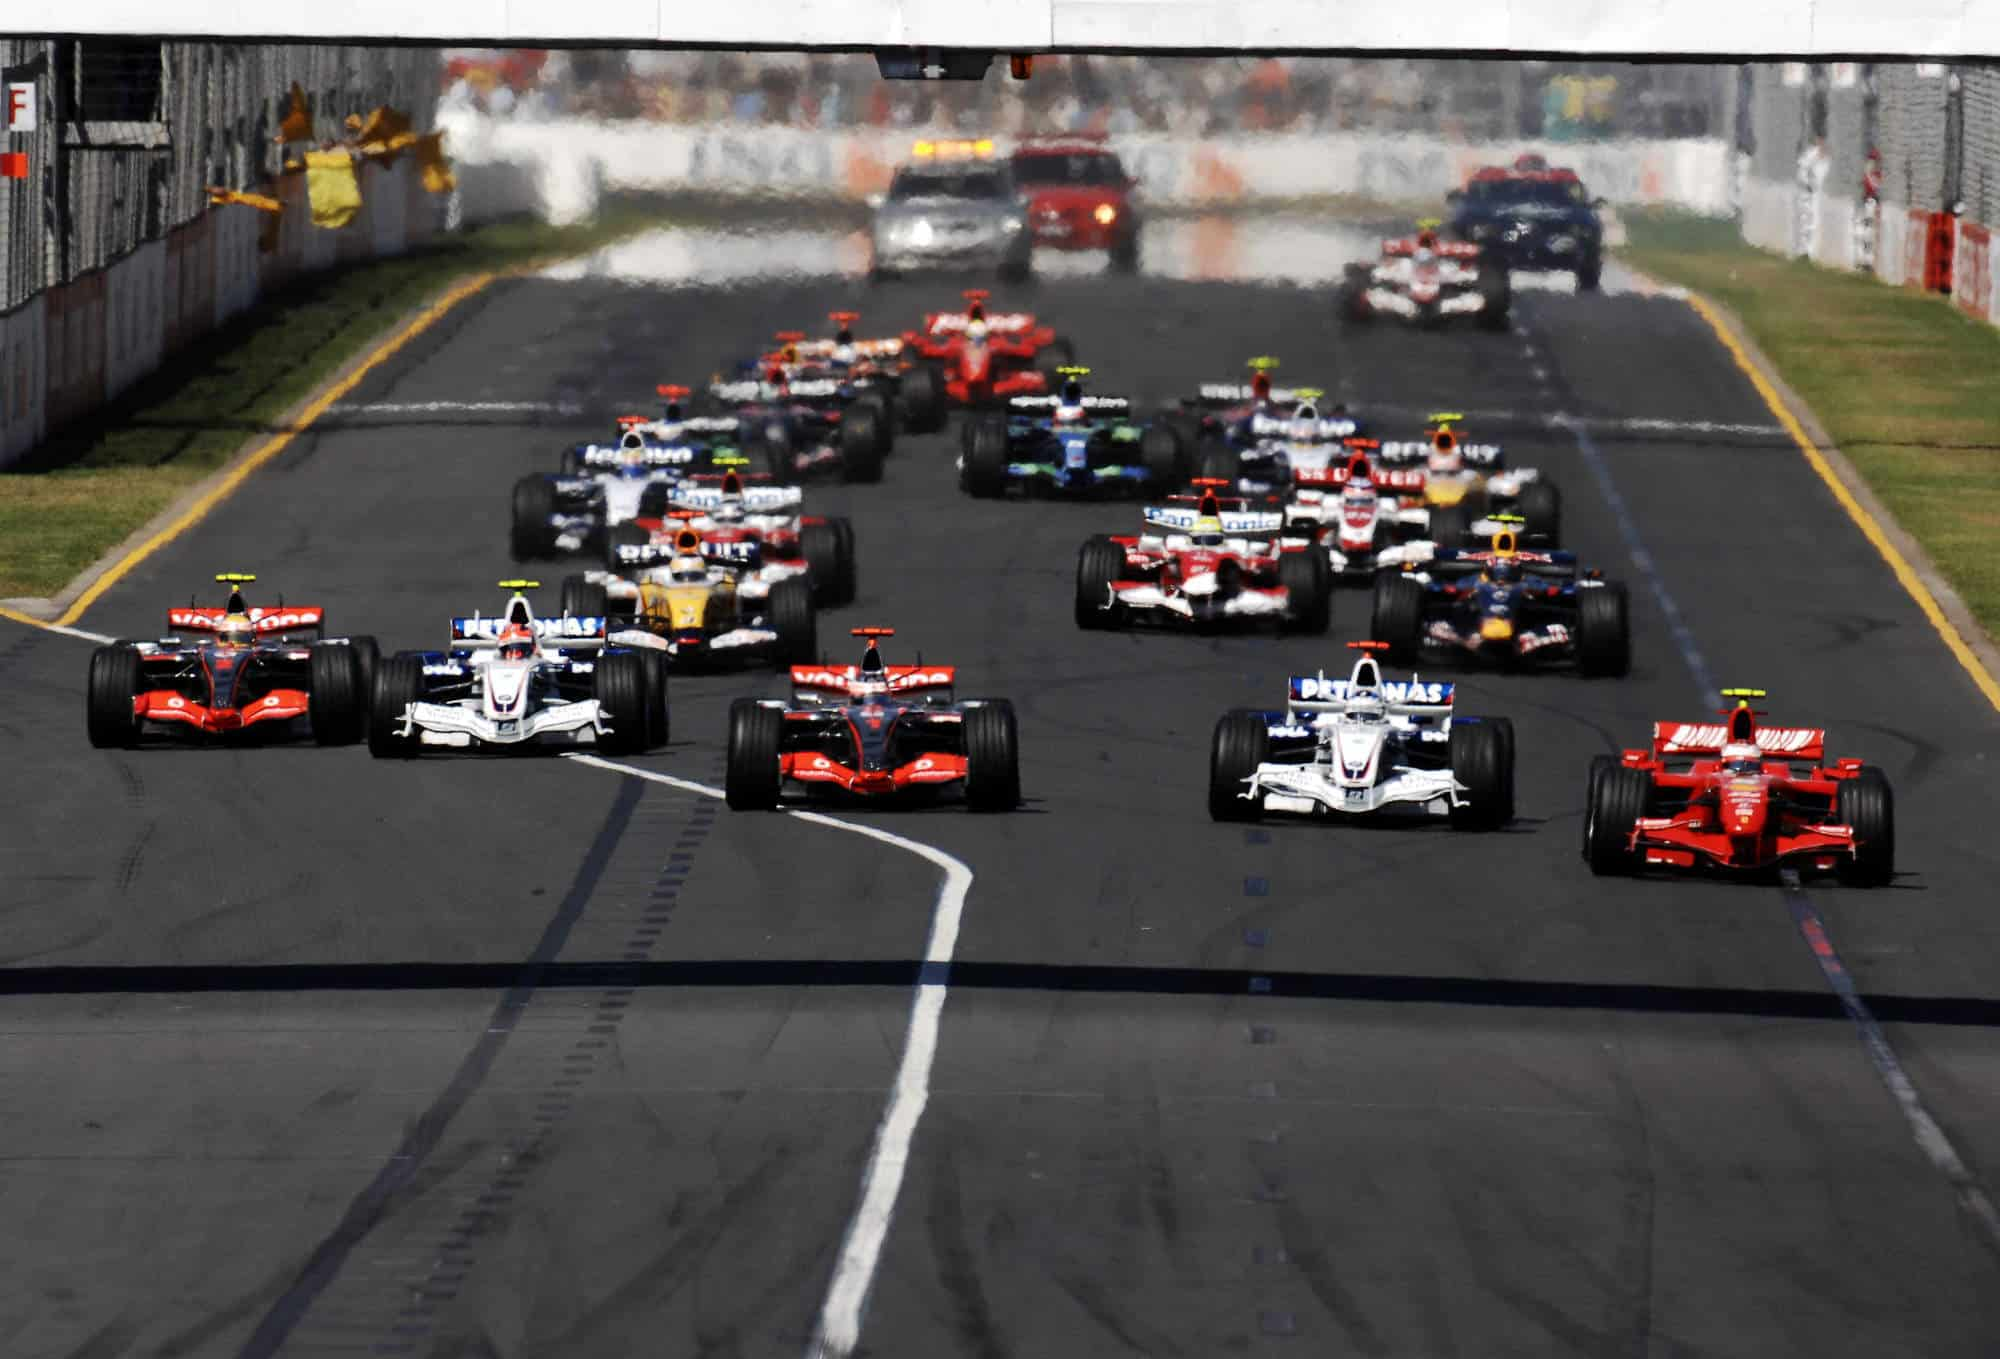 2007 Australian GP start Photo Ferrari